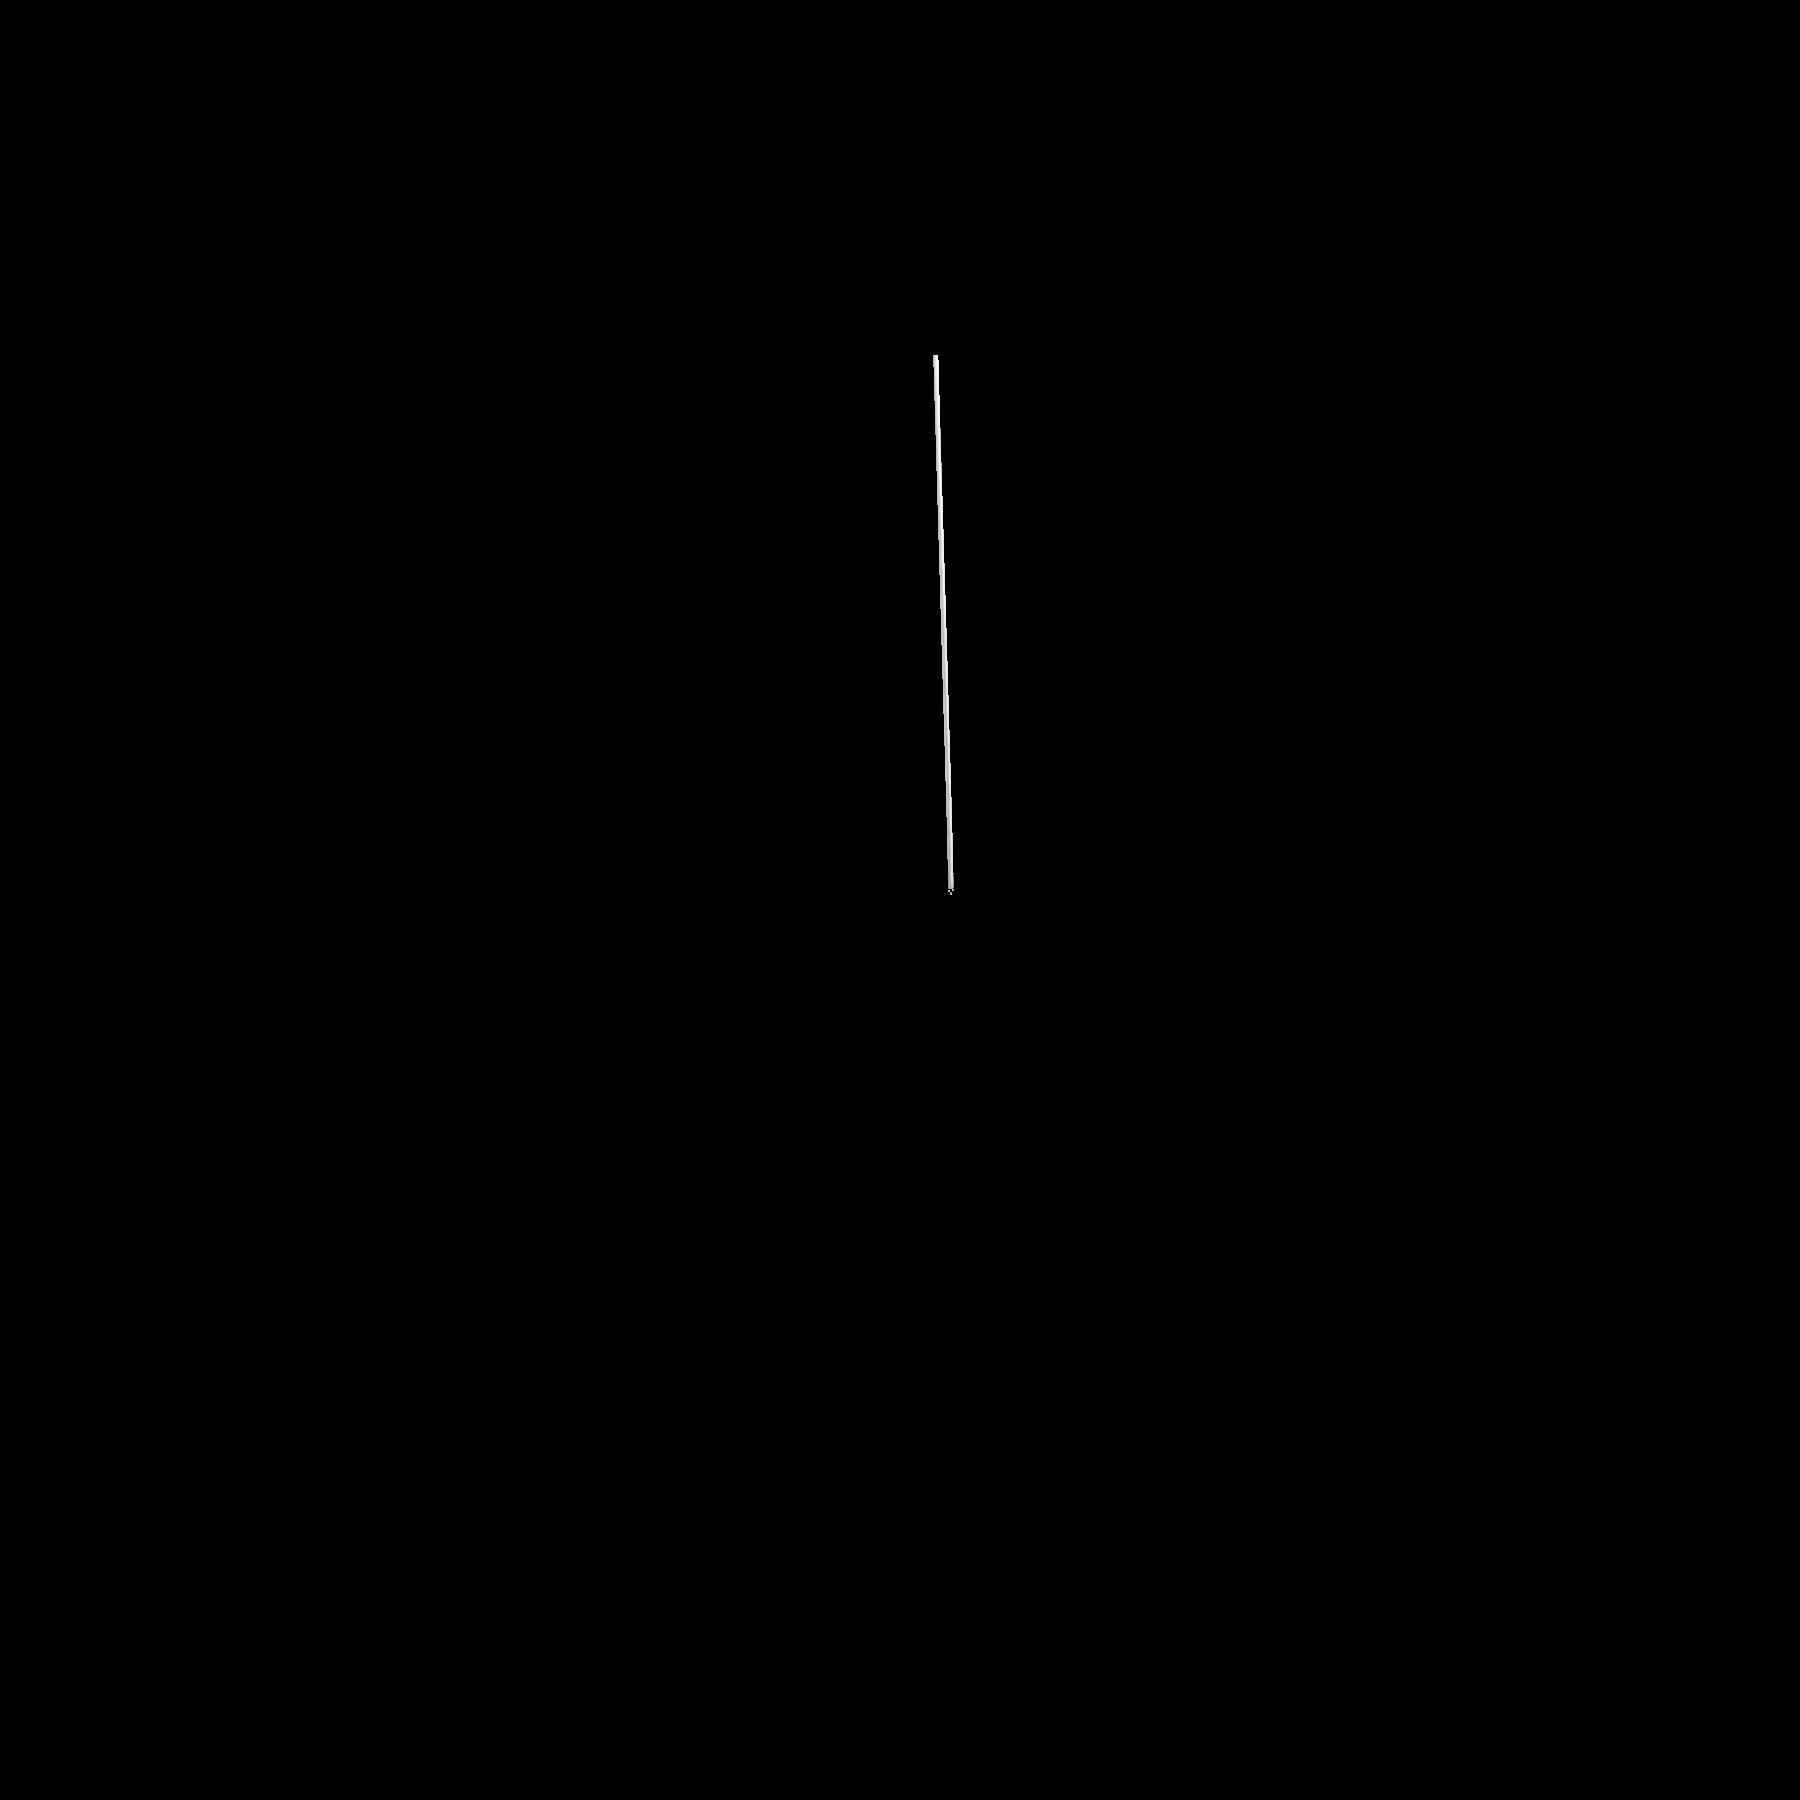 fune2